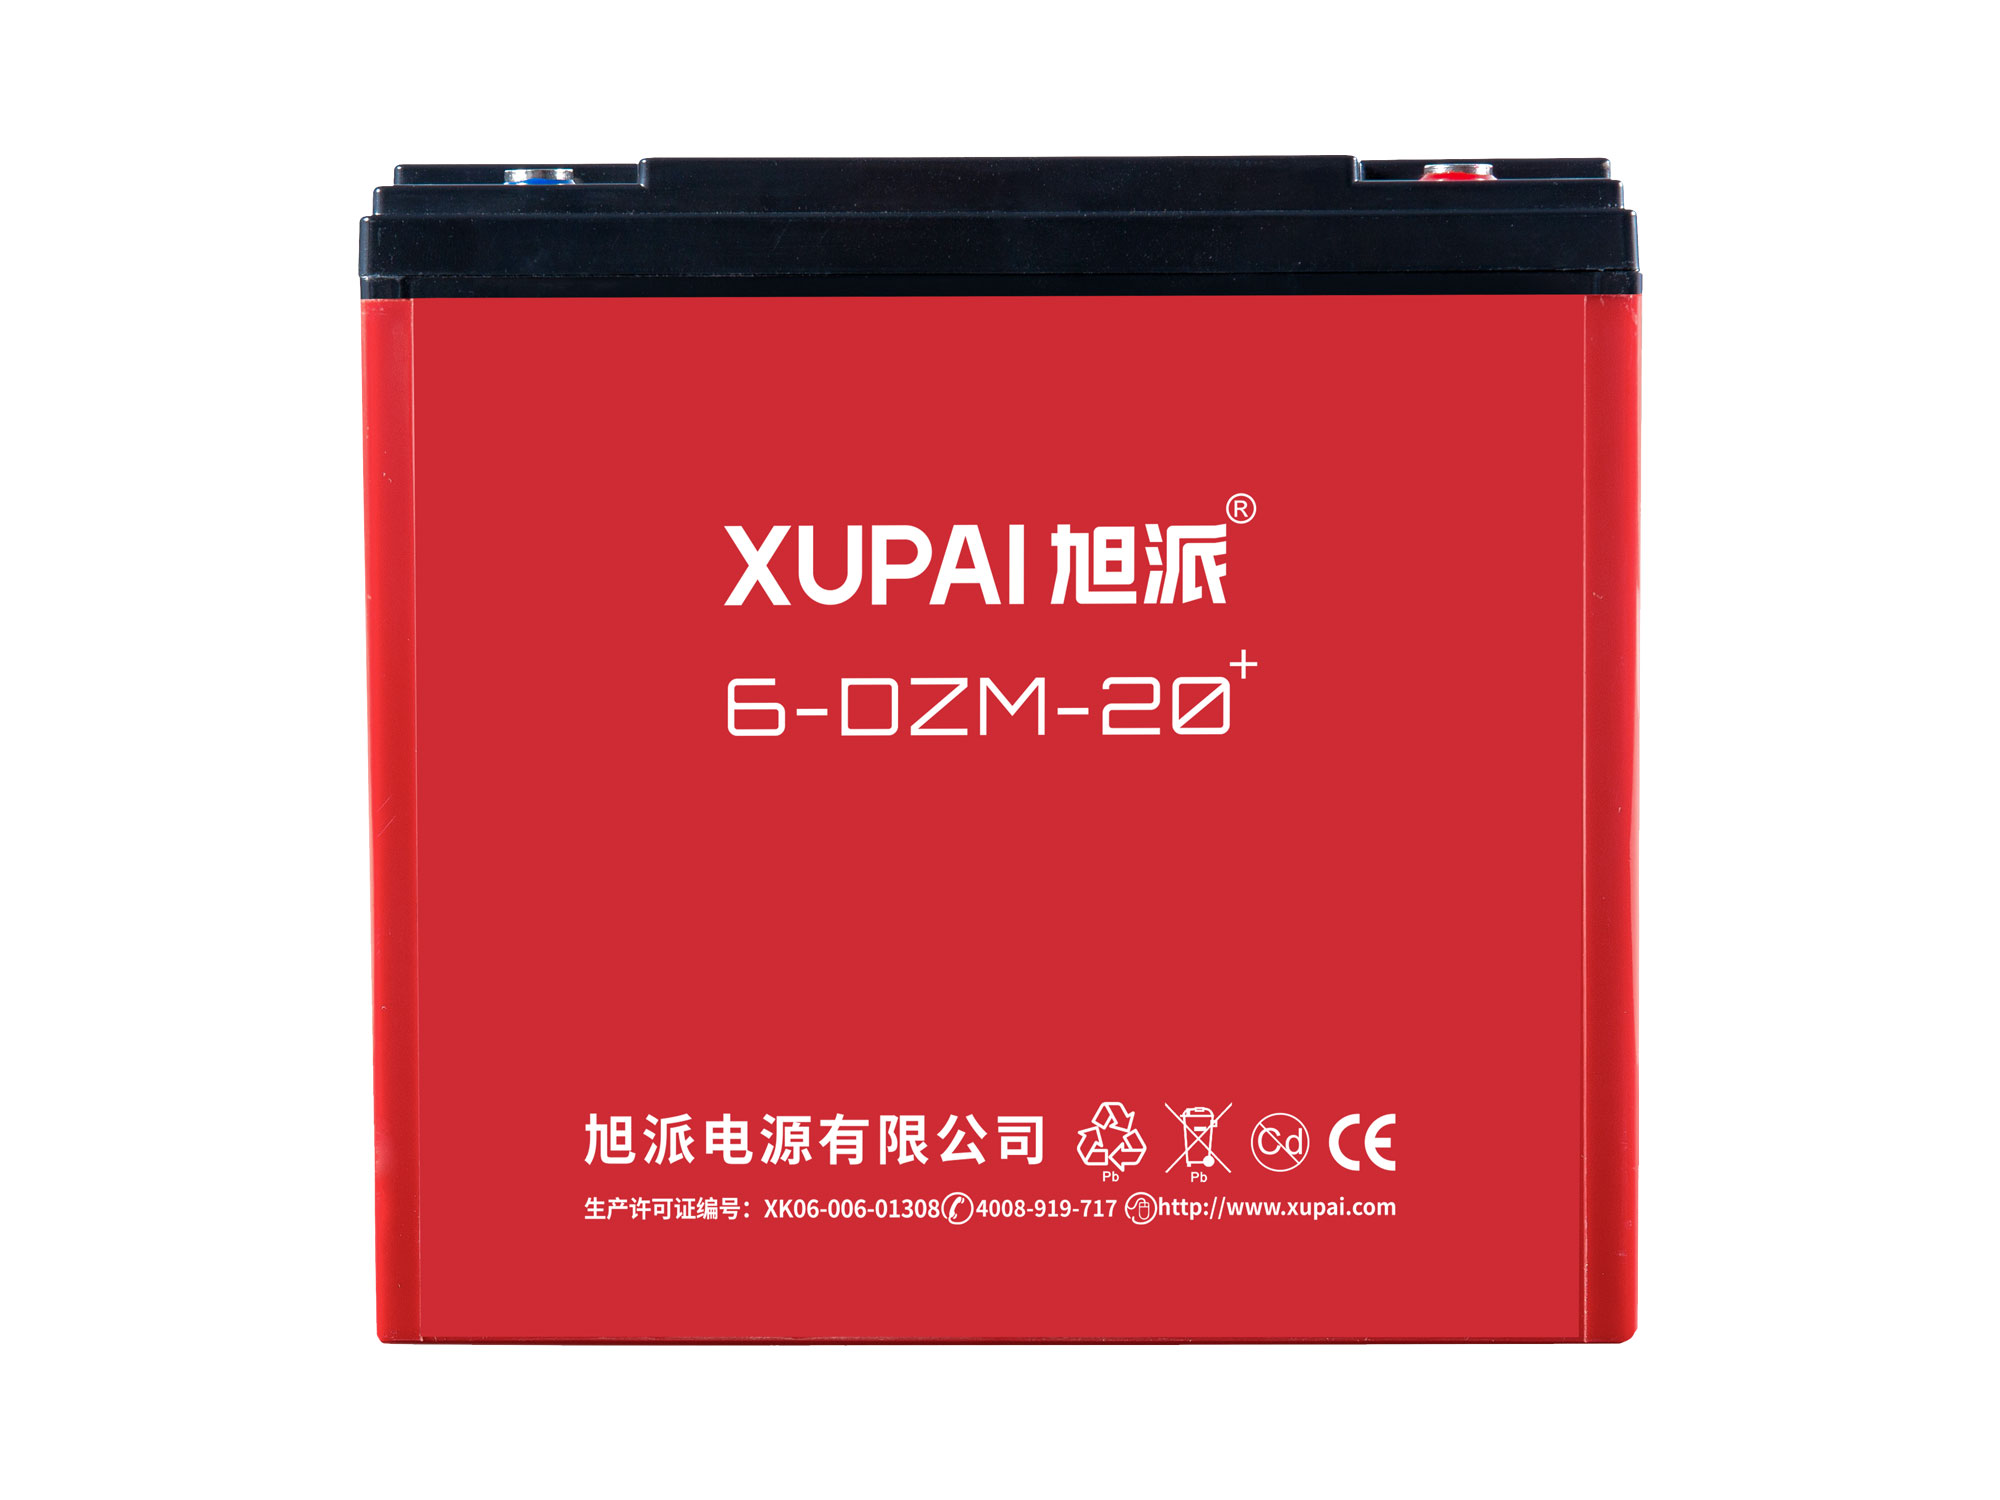 6-dzm-20+超级电池